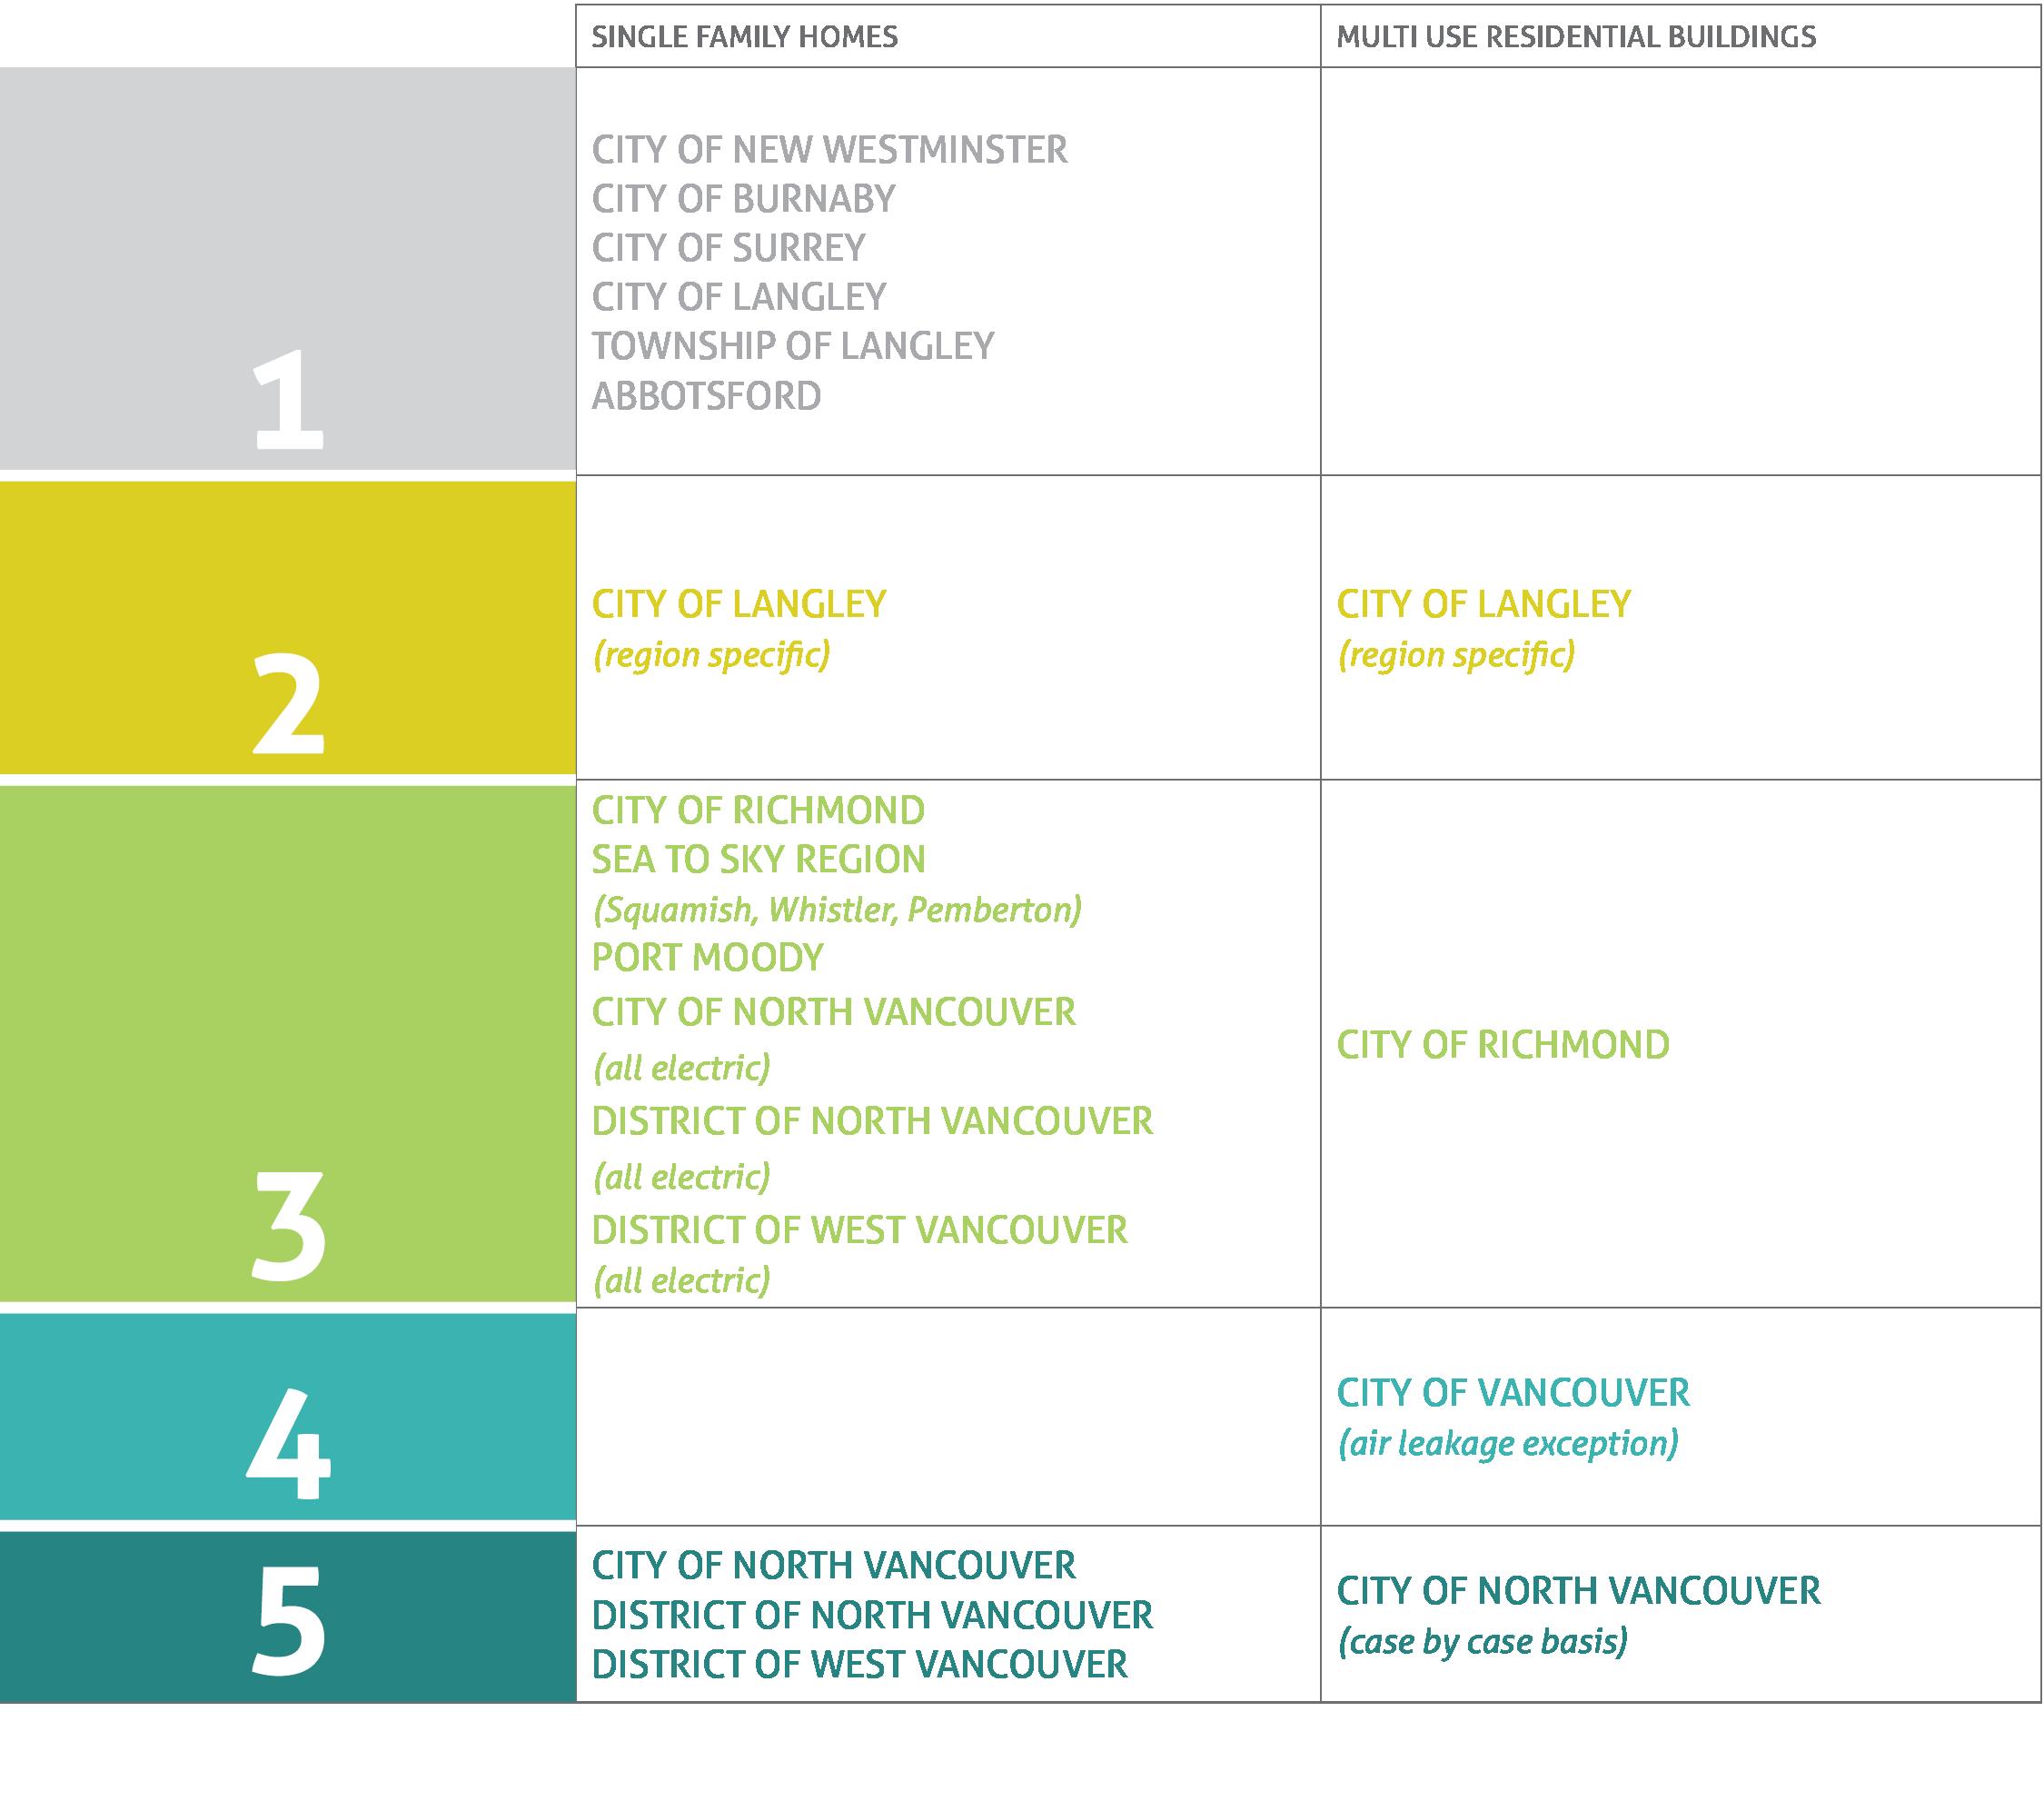 BC Energy Step Code adoption 2020-2021